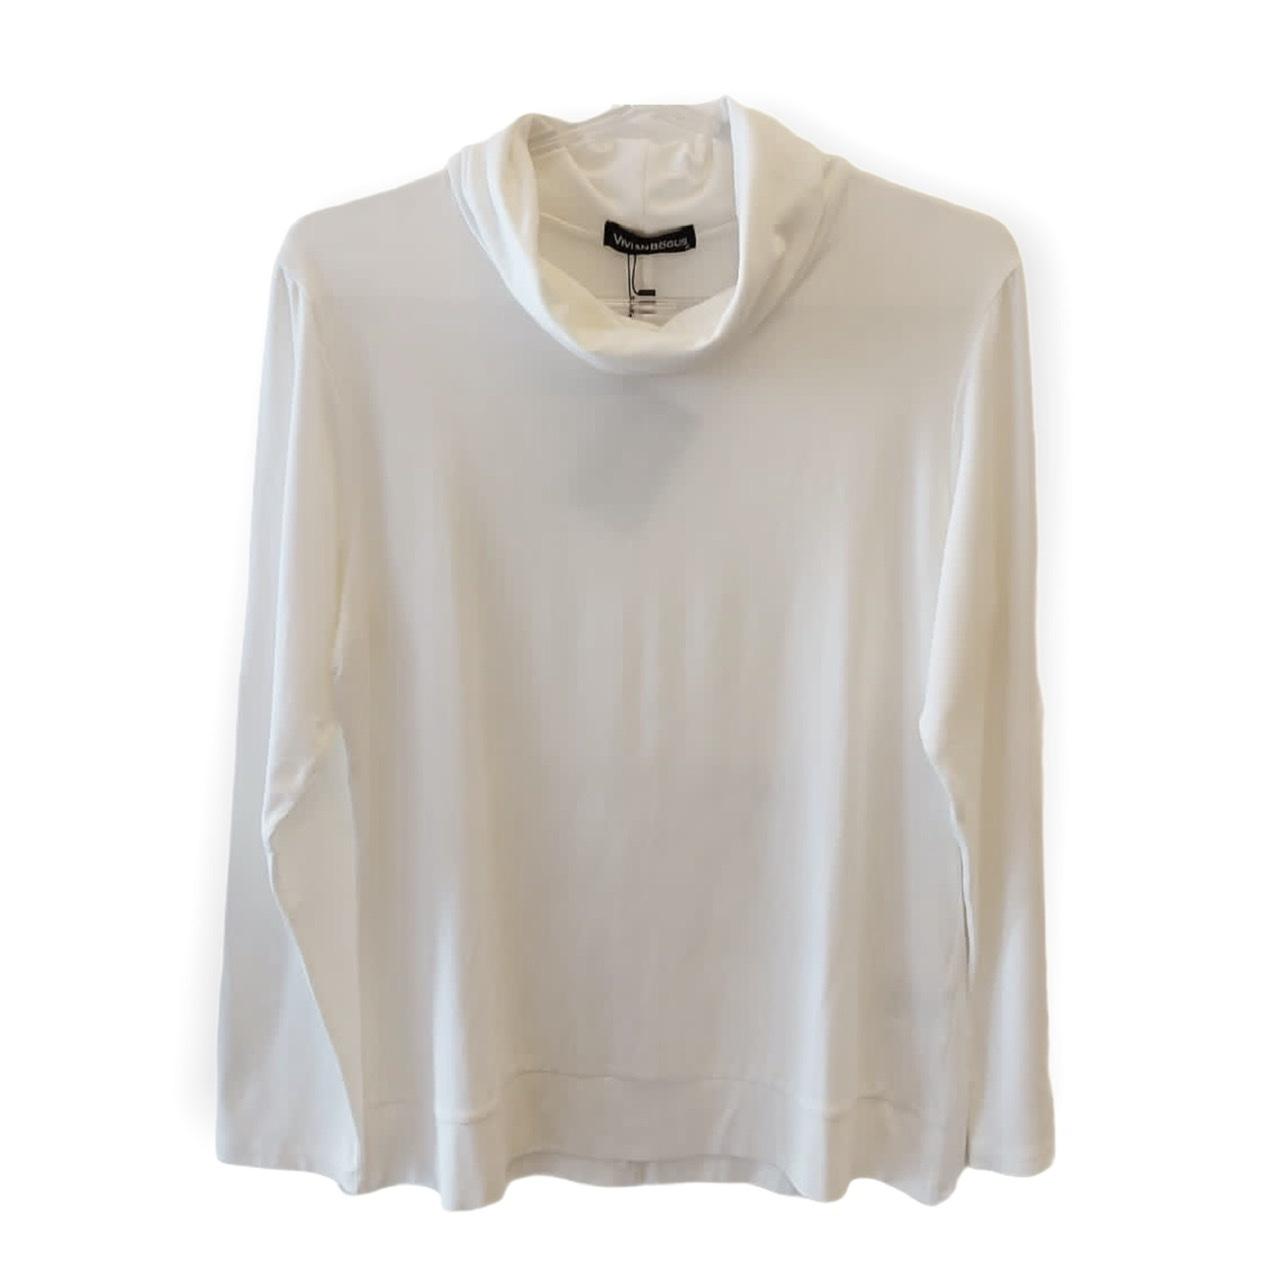 Blusa off white manga longa com gola